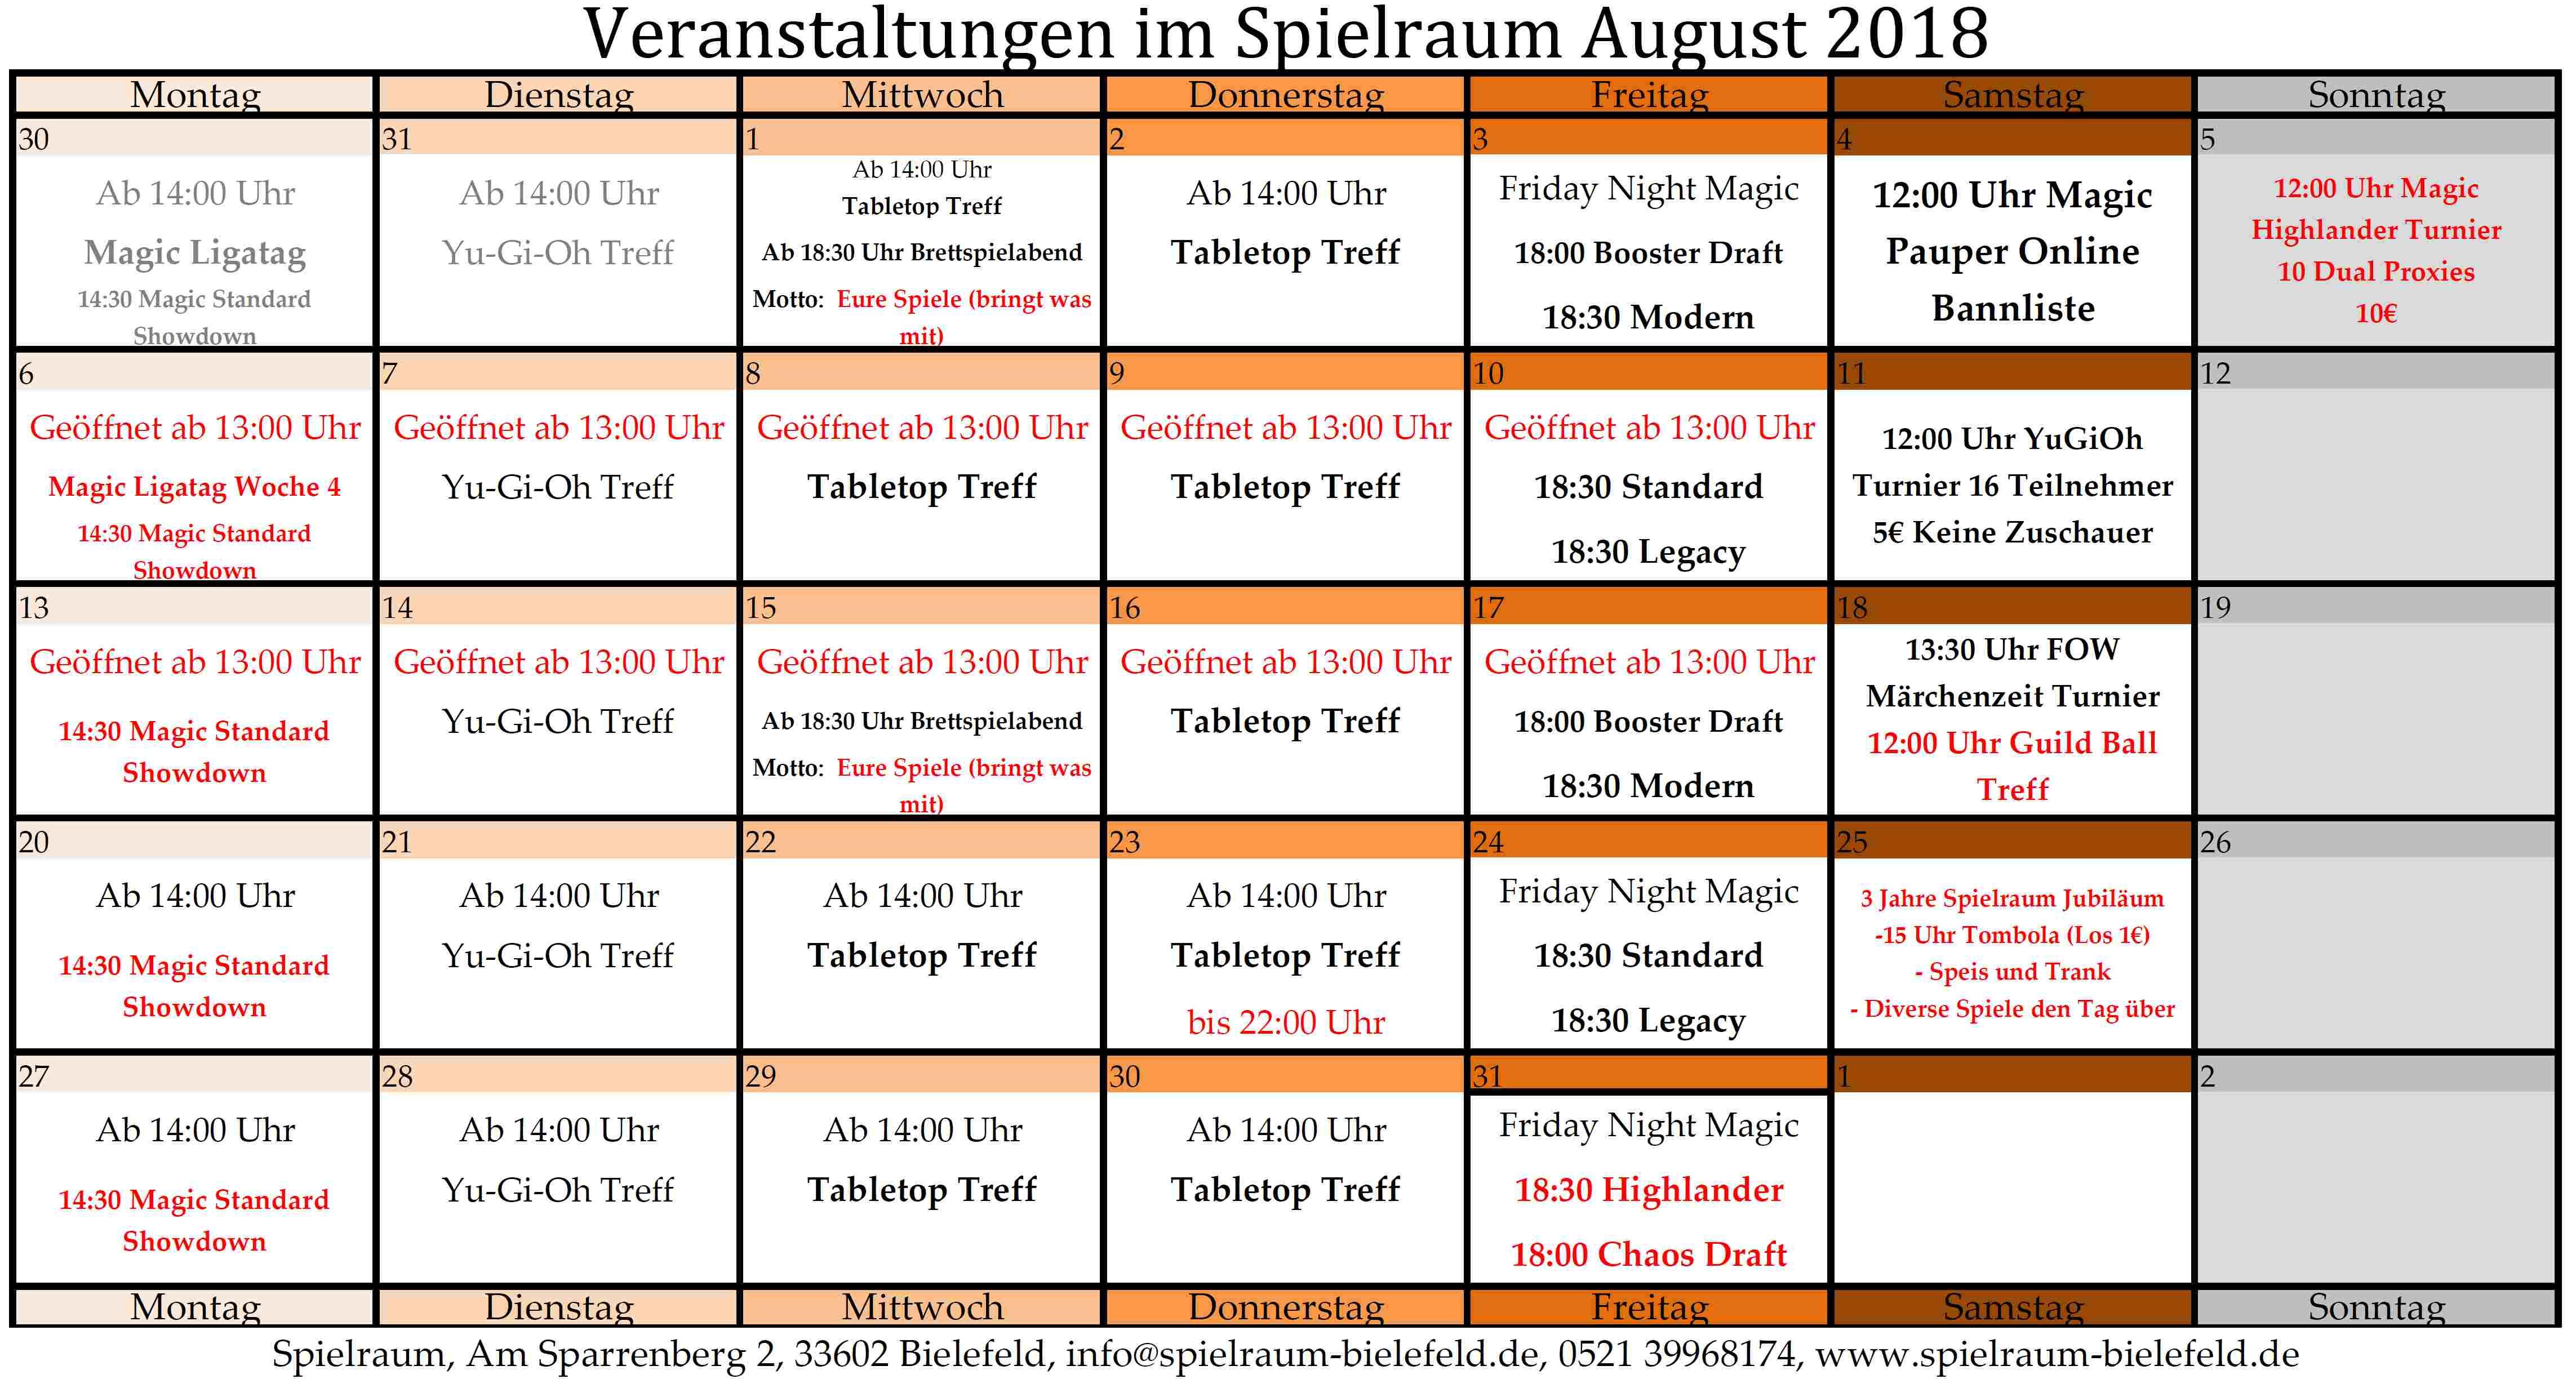 Monatsplan august 2018